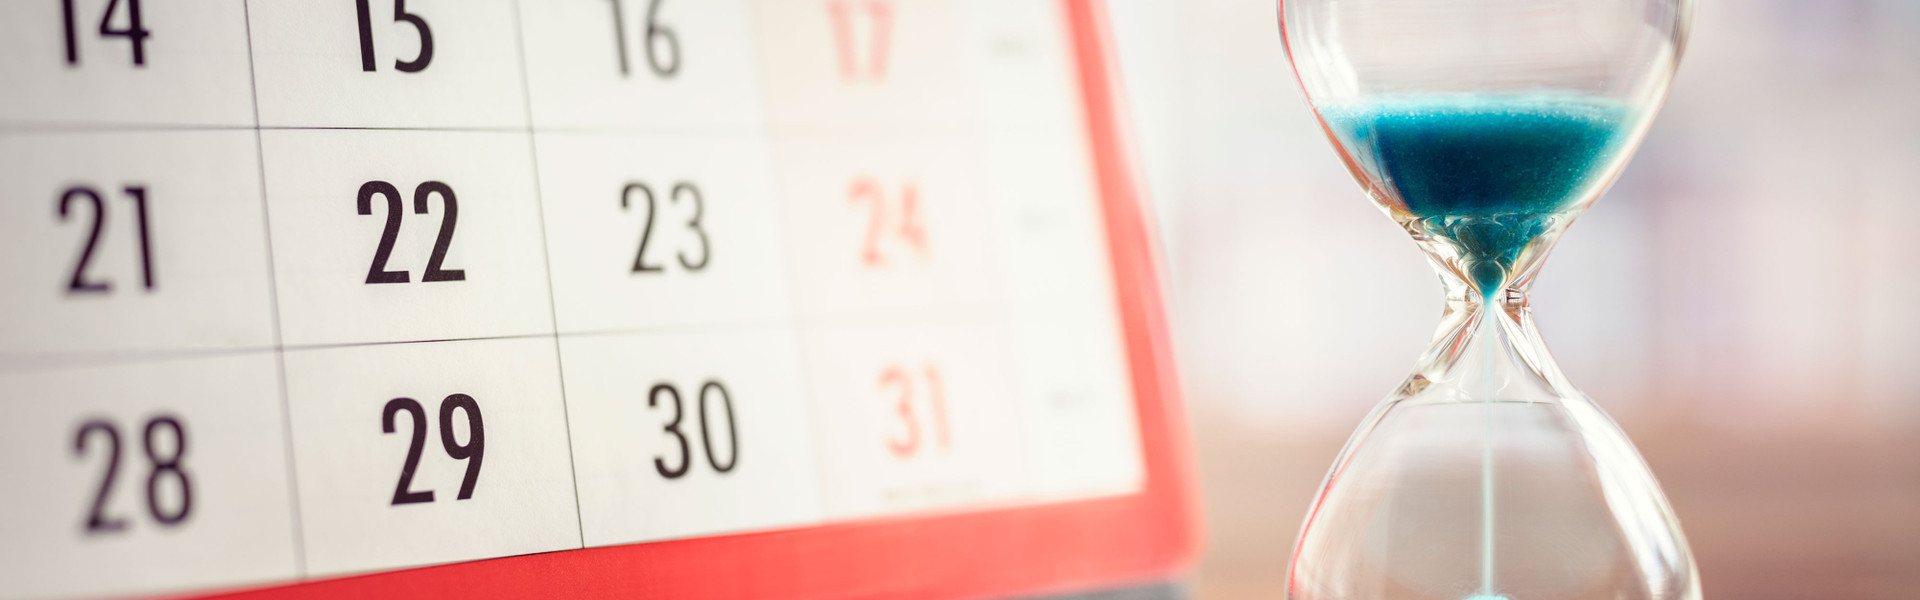 Mark Calendar For Advanced Purchase Hotel Discounts | Westgate Palace Orlando | Secret Hotel Rates For Hotels on International Drive, Orlando, FL 32819